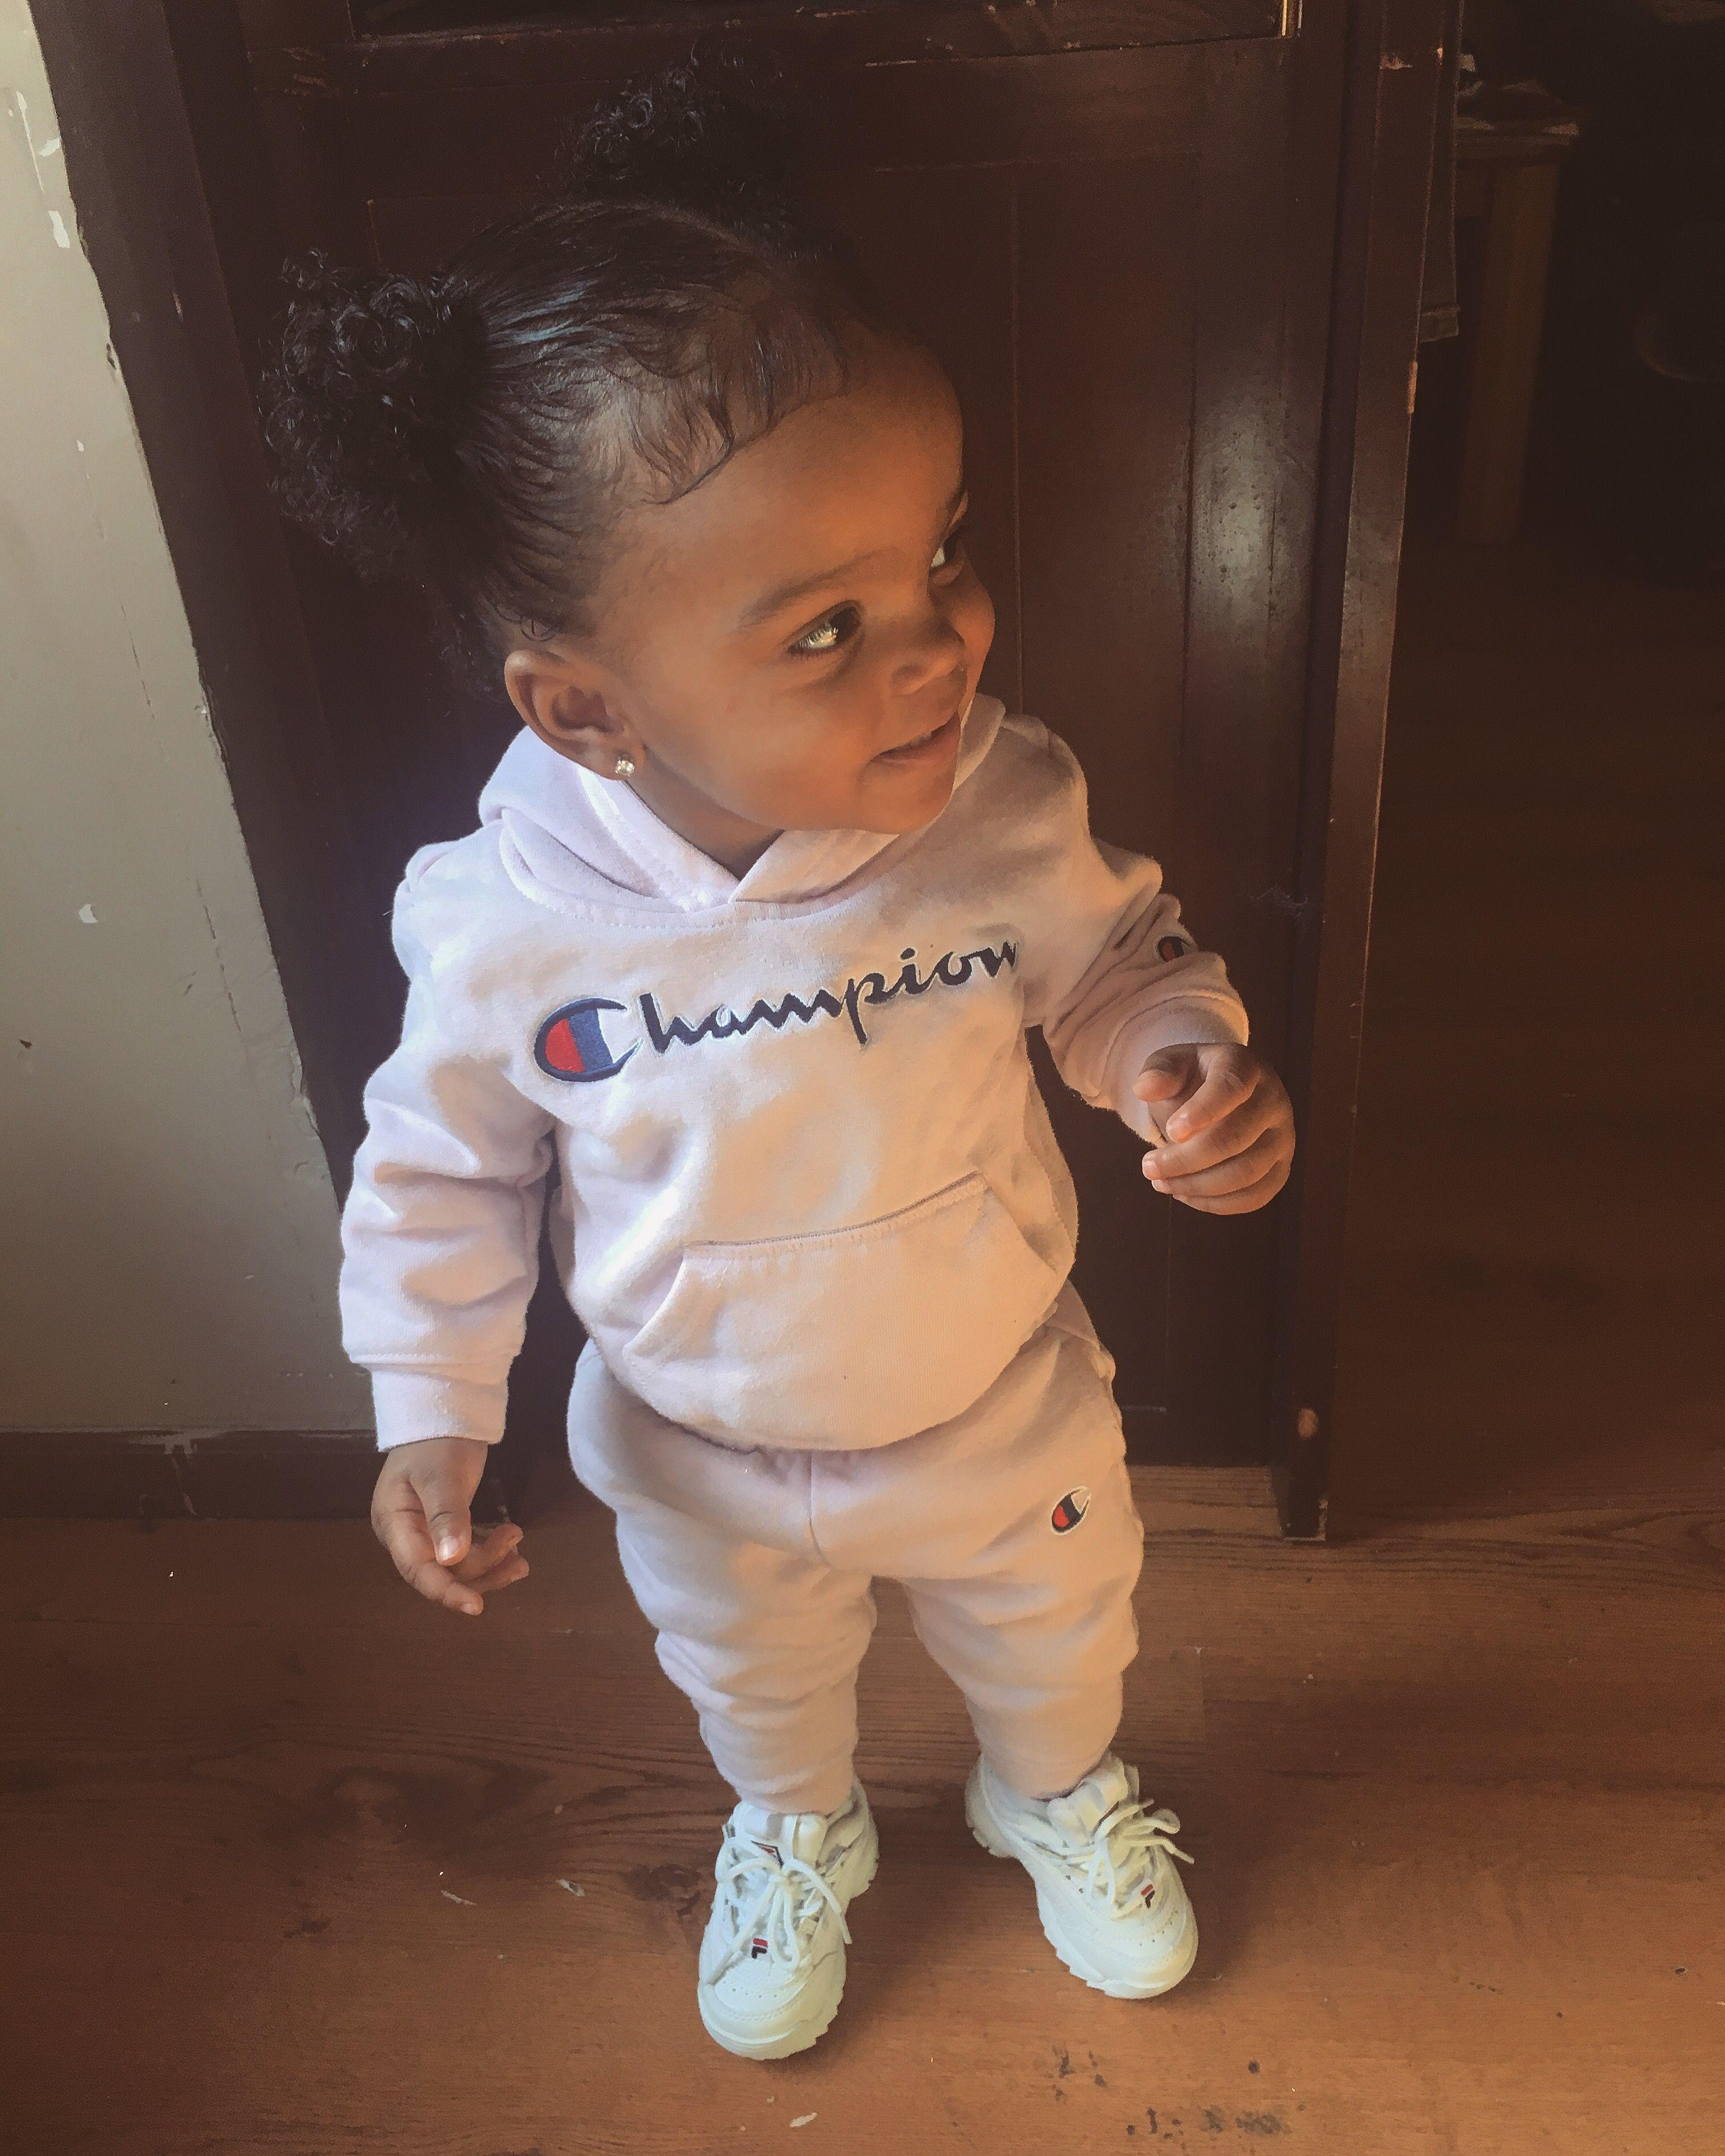 Pinterest Califoreignia Pretty Baby Baby Trend Baby Fashion